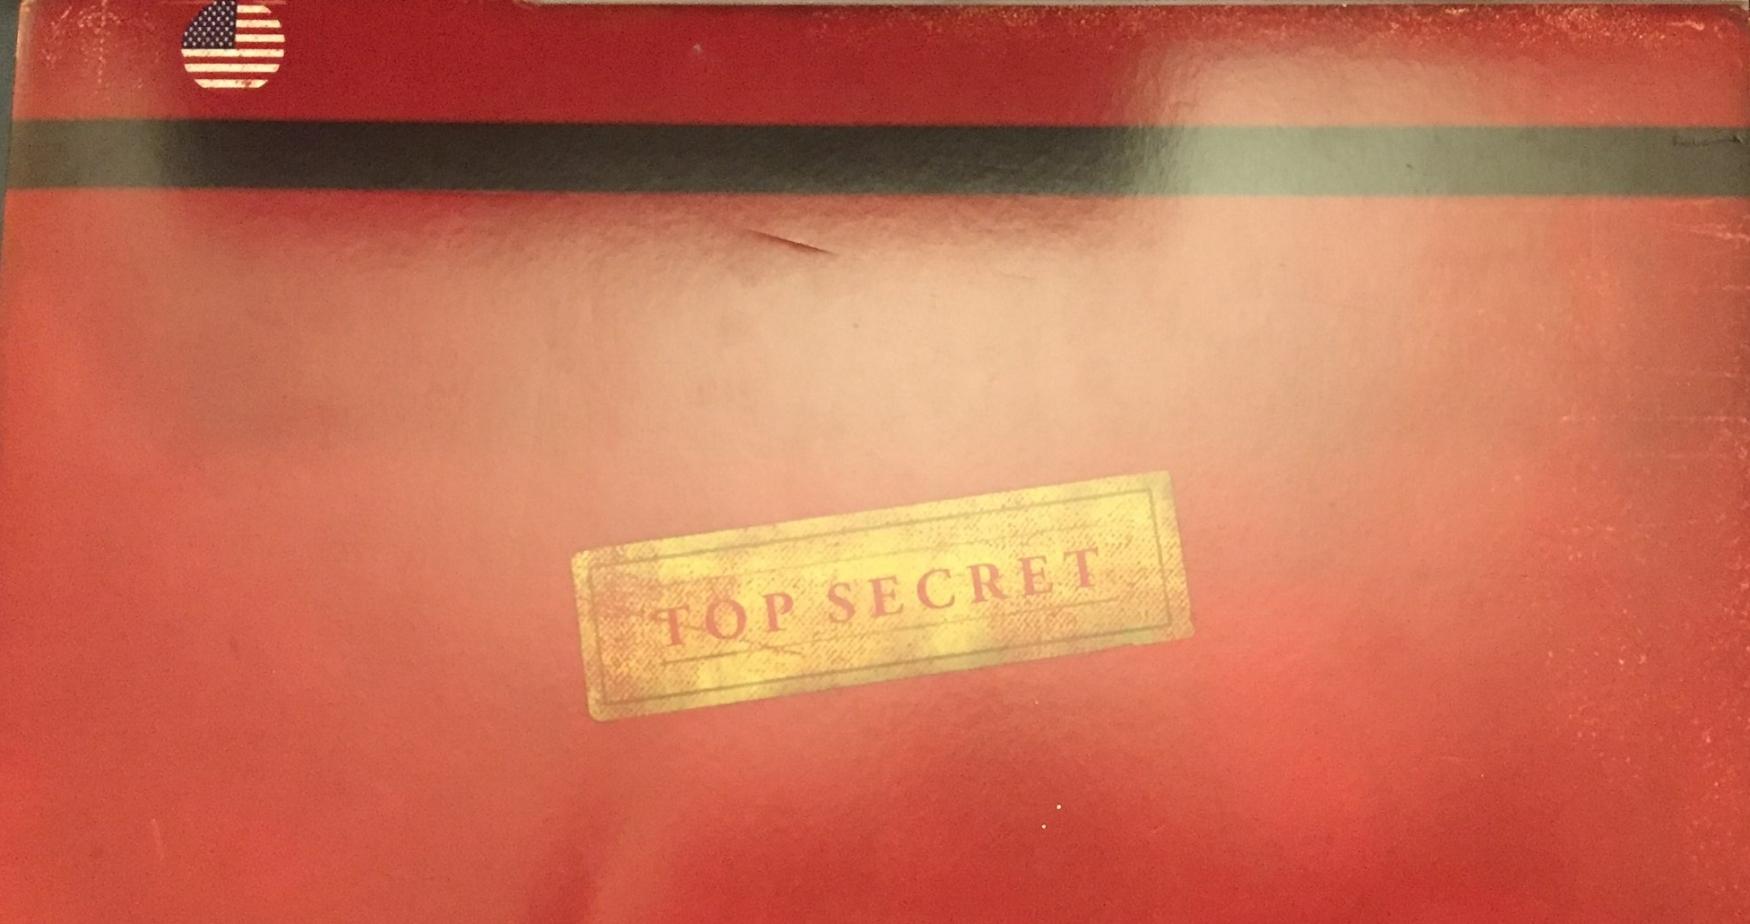 Top secret? Can't we just open it now? Just a peek?